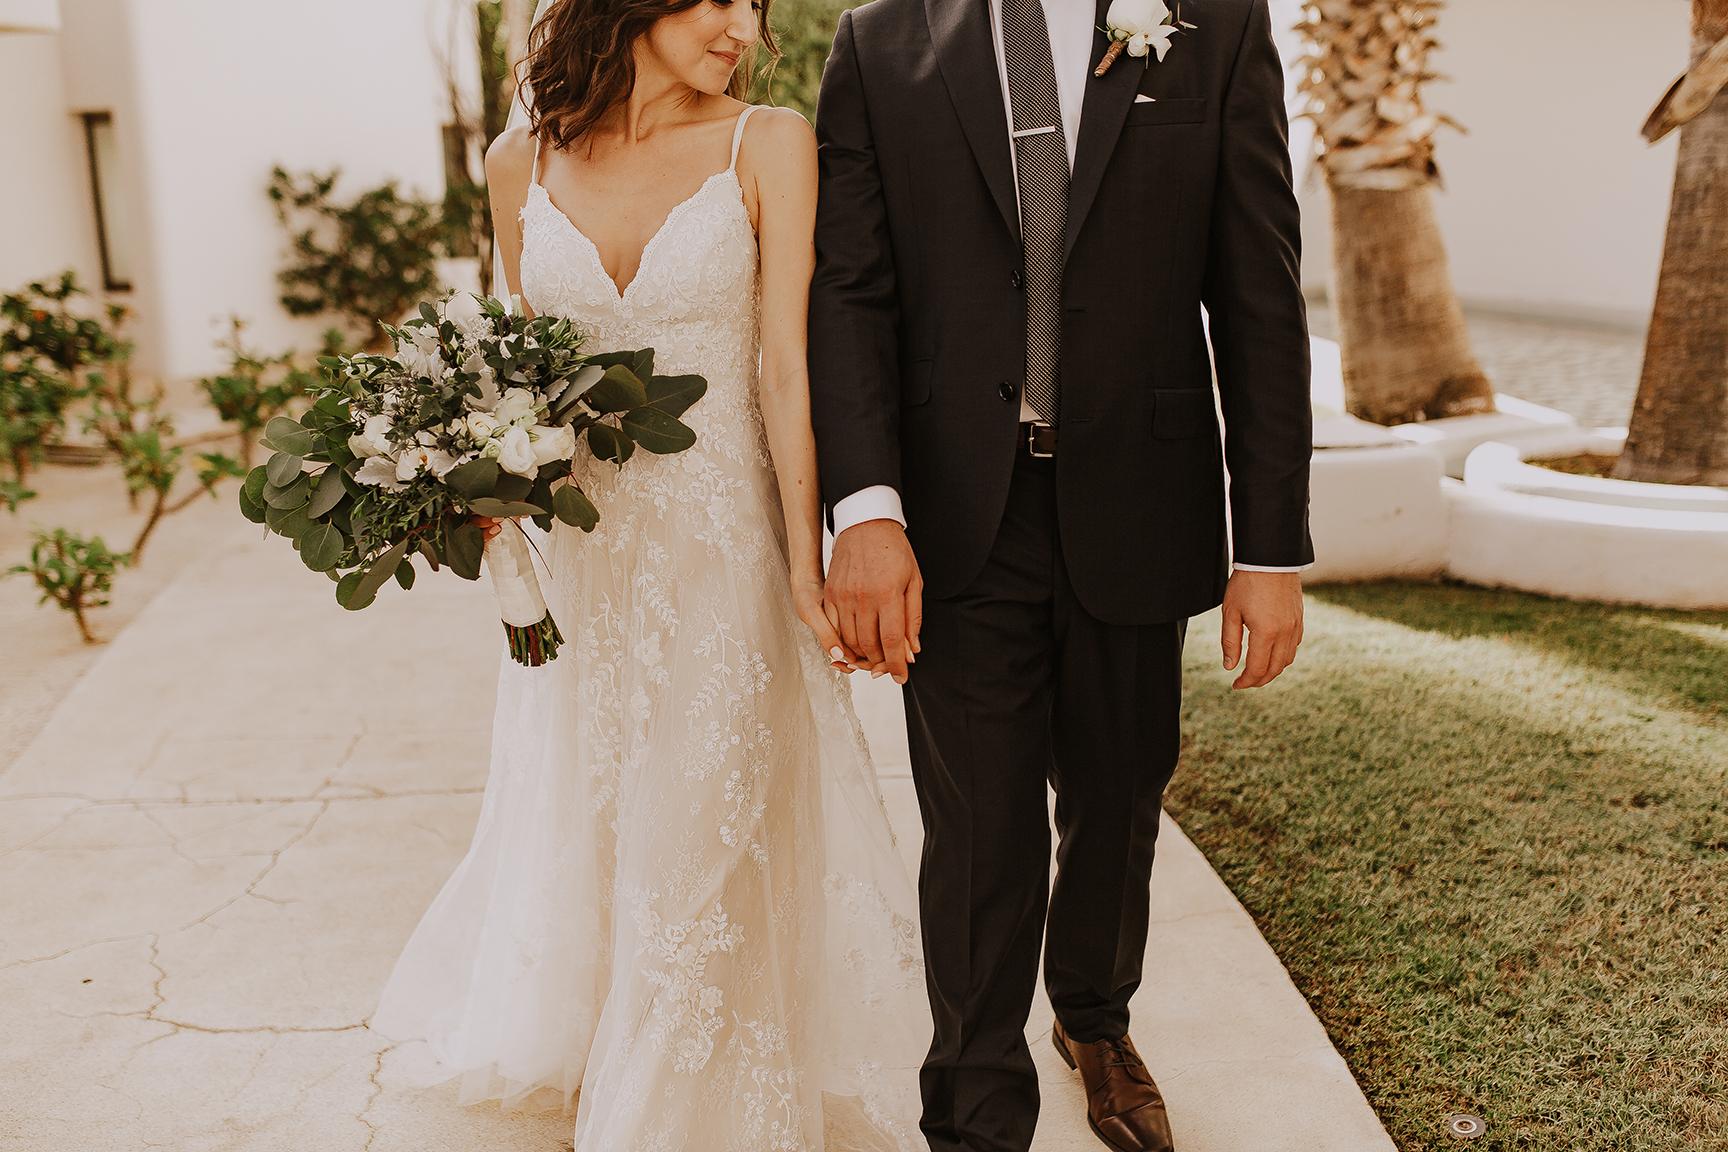 Lindsei+James_cabo_wedding_435.jpg